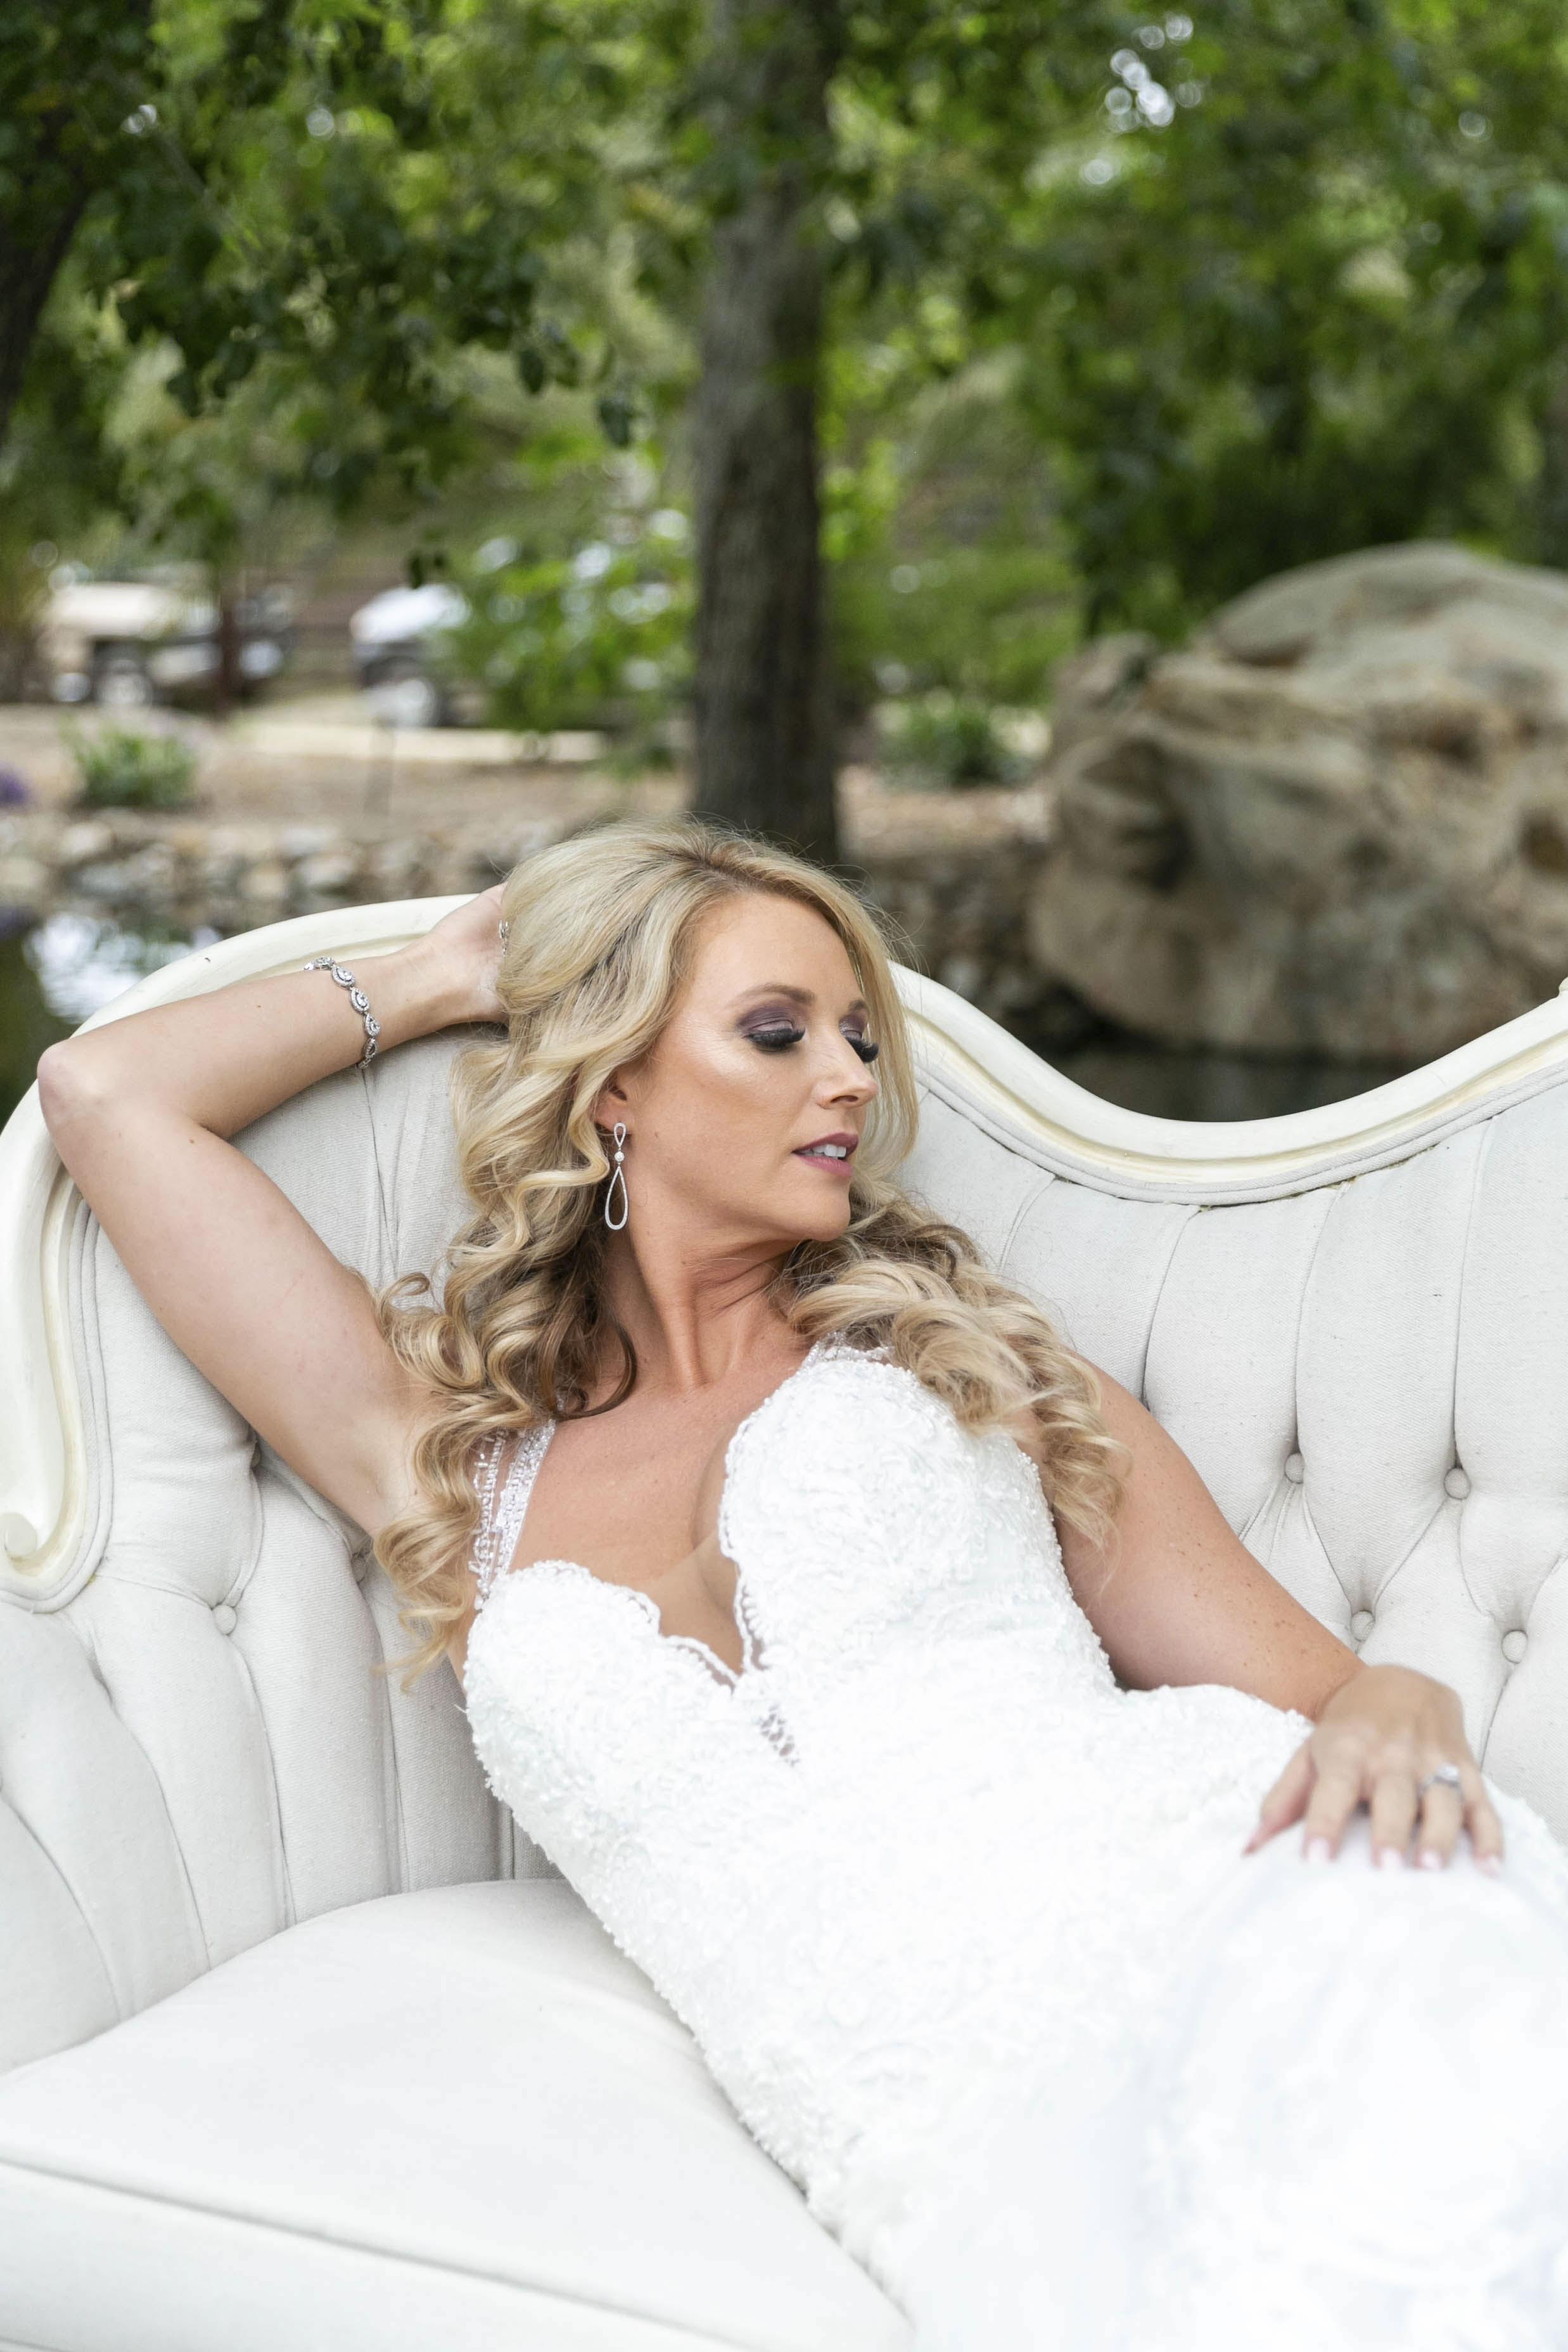 Domenica Beauty _ Hair and Makeup Artist _Wedding _ Temecula, CA Wedding _ Briana and Samuel _ 18.JPG